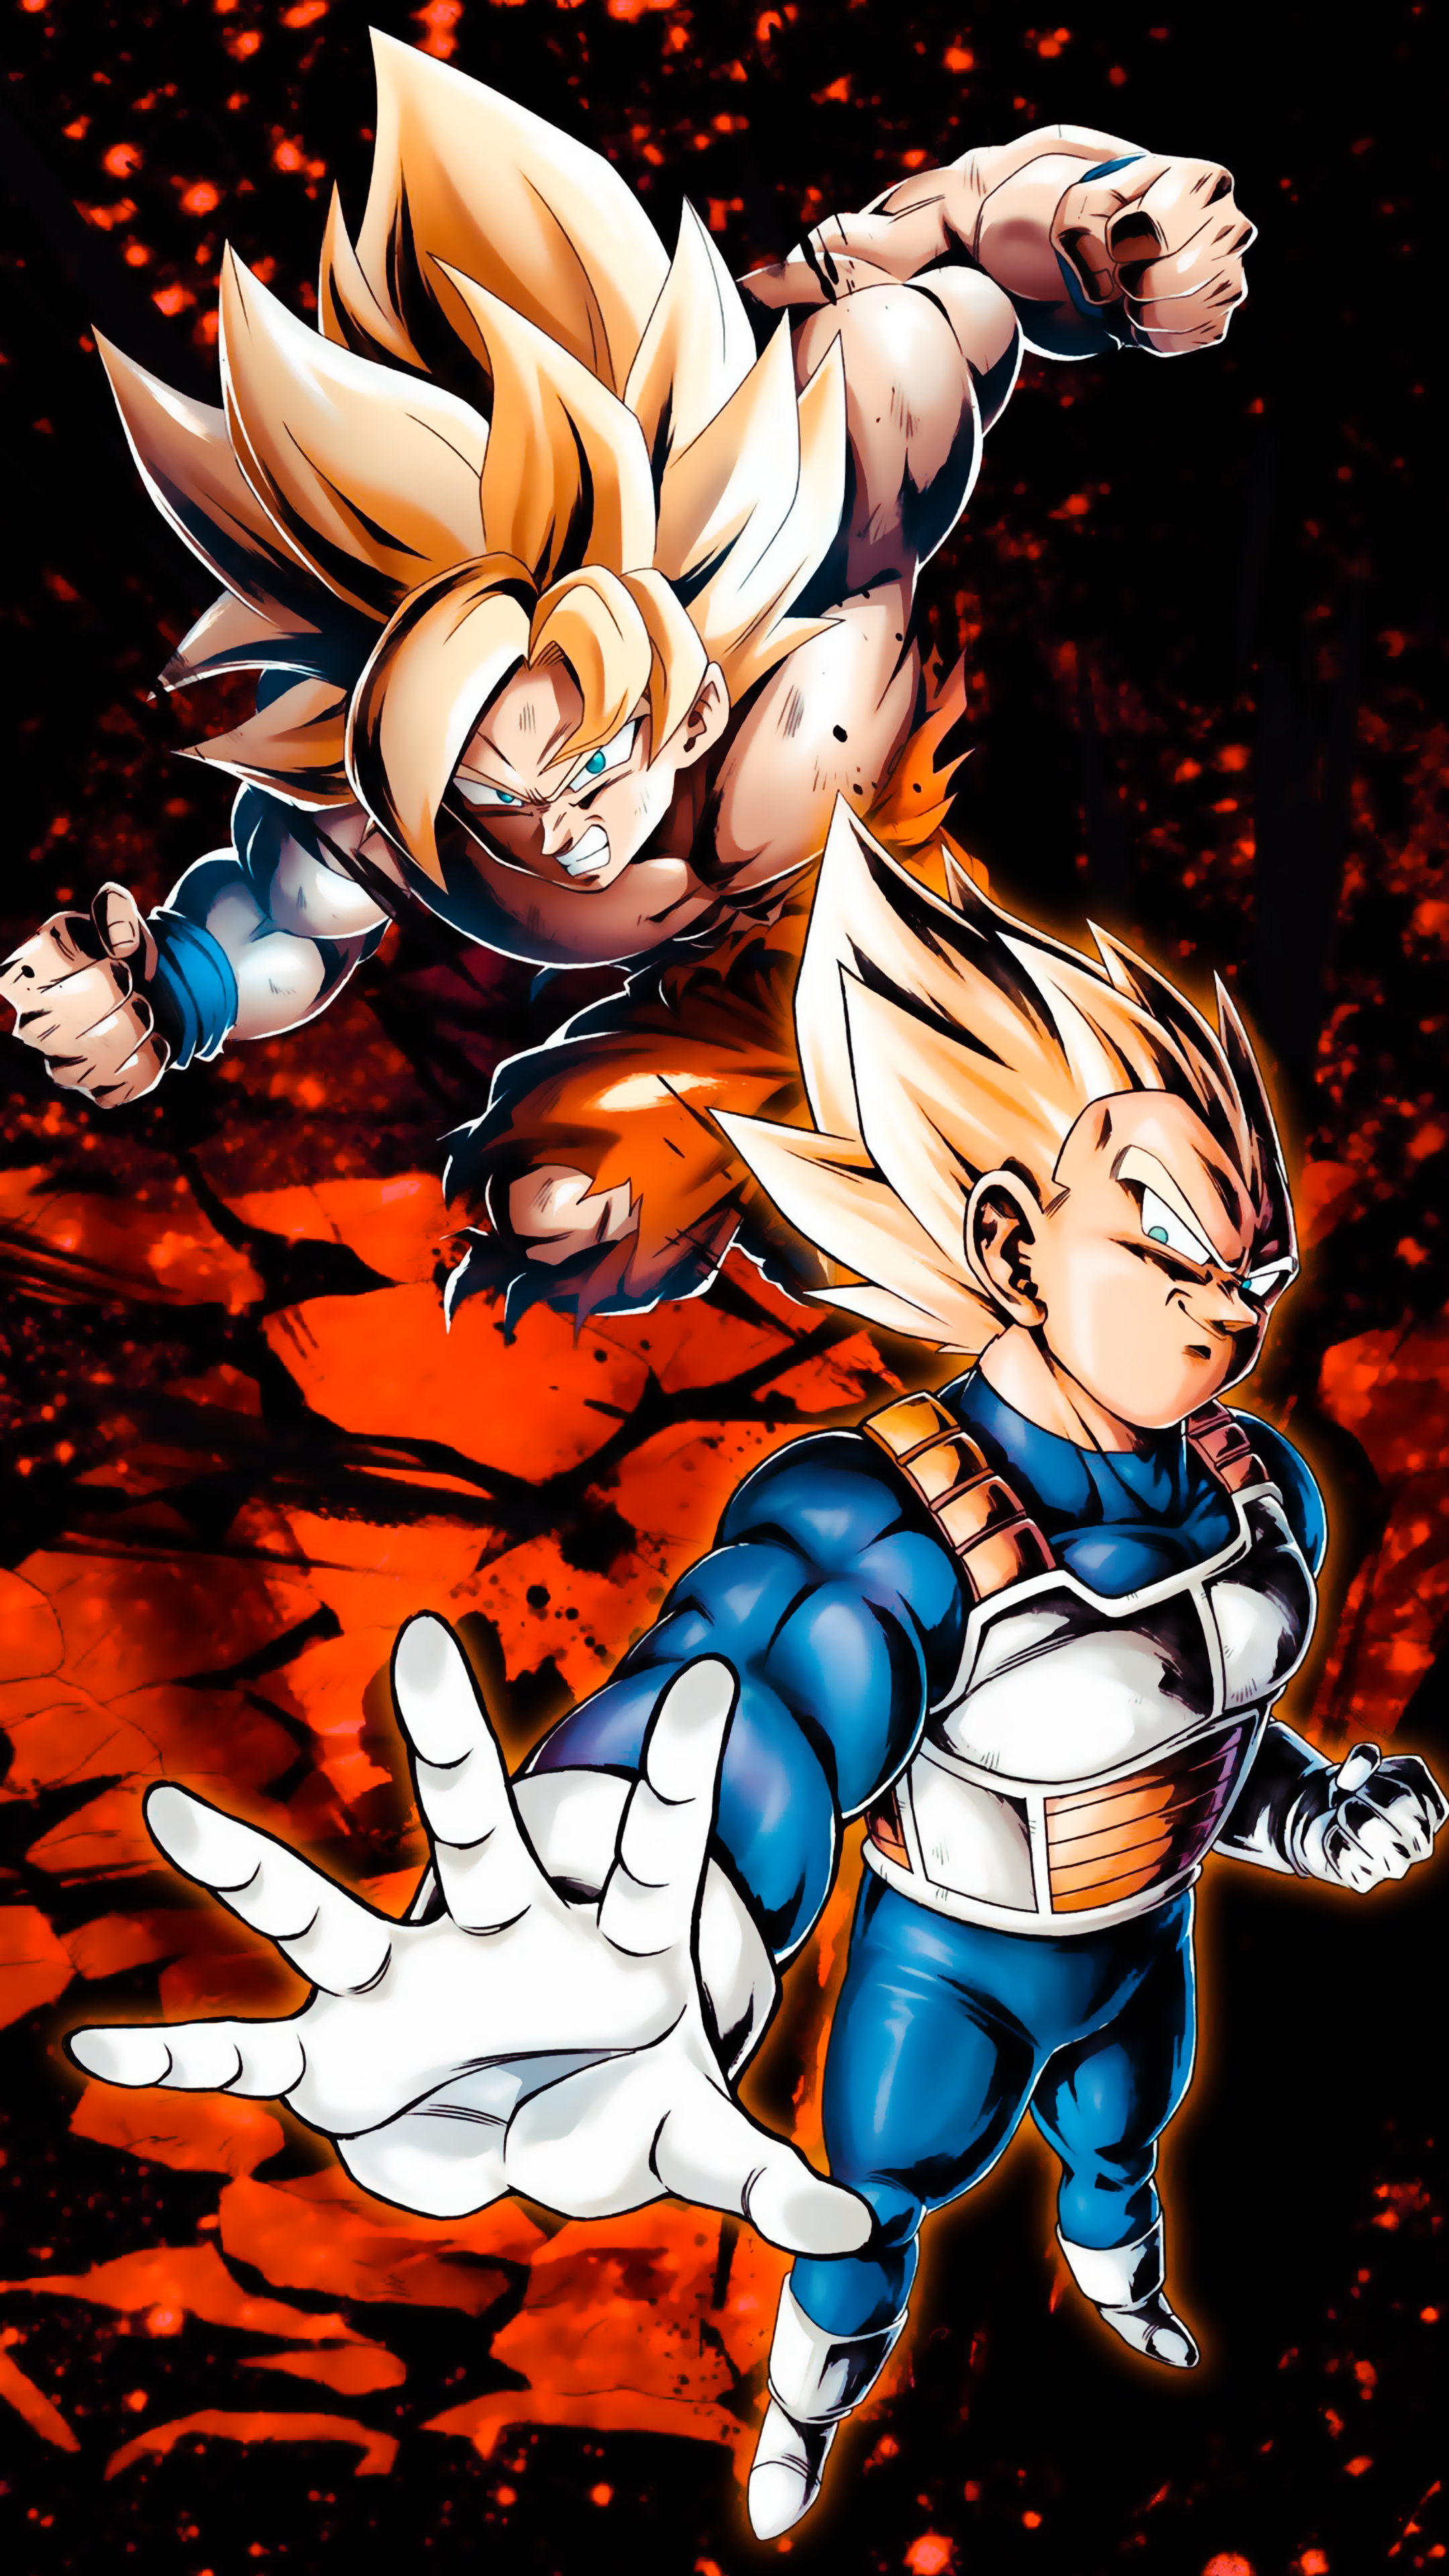 28 Anime Wallpaper 4k Goku